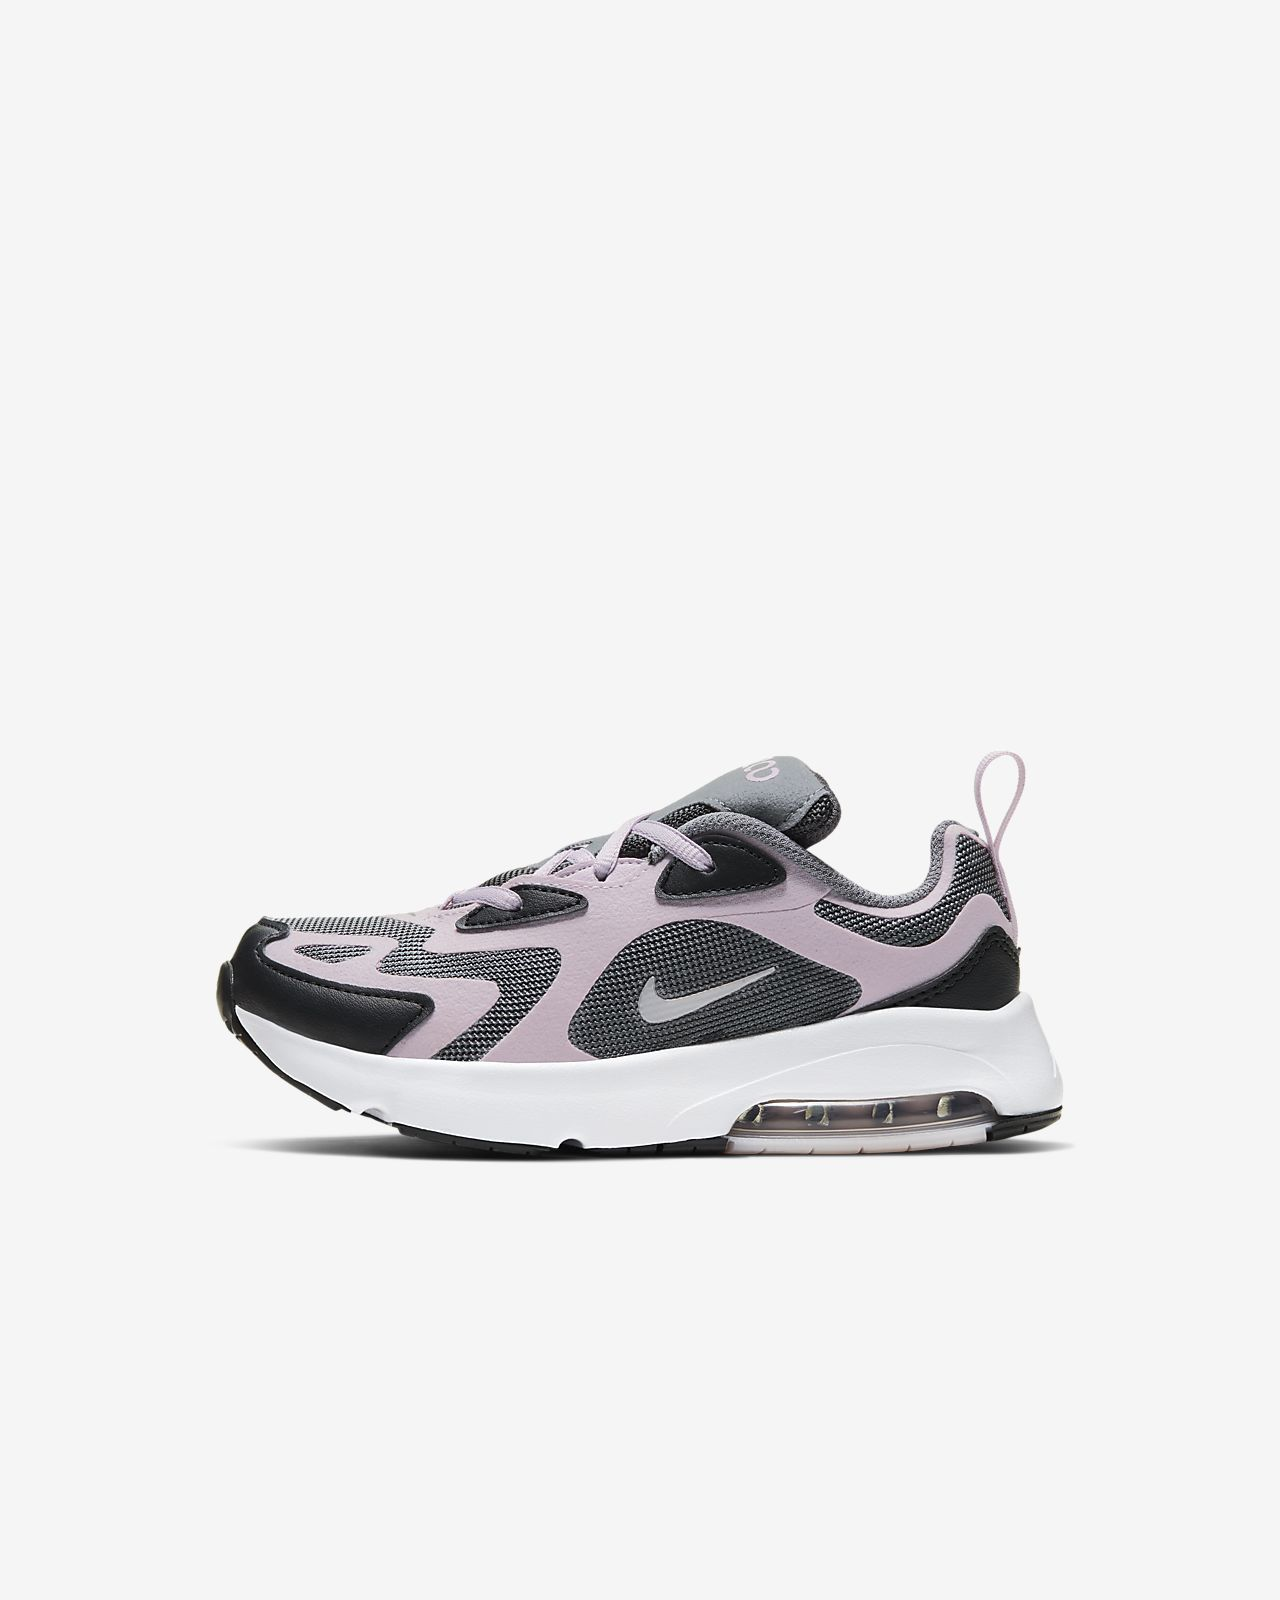 Chaussure Jeune Nike Air pour Max 200 enfant eIYbEWH2D9